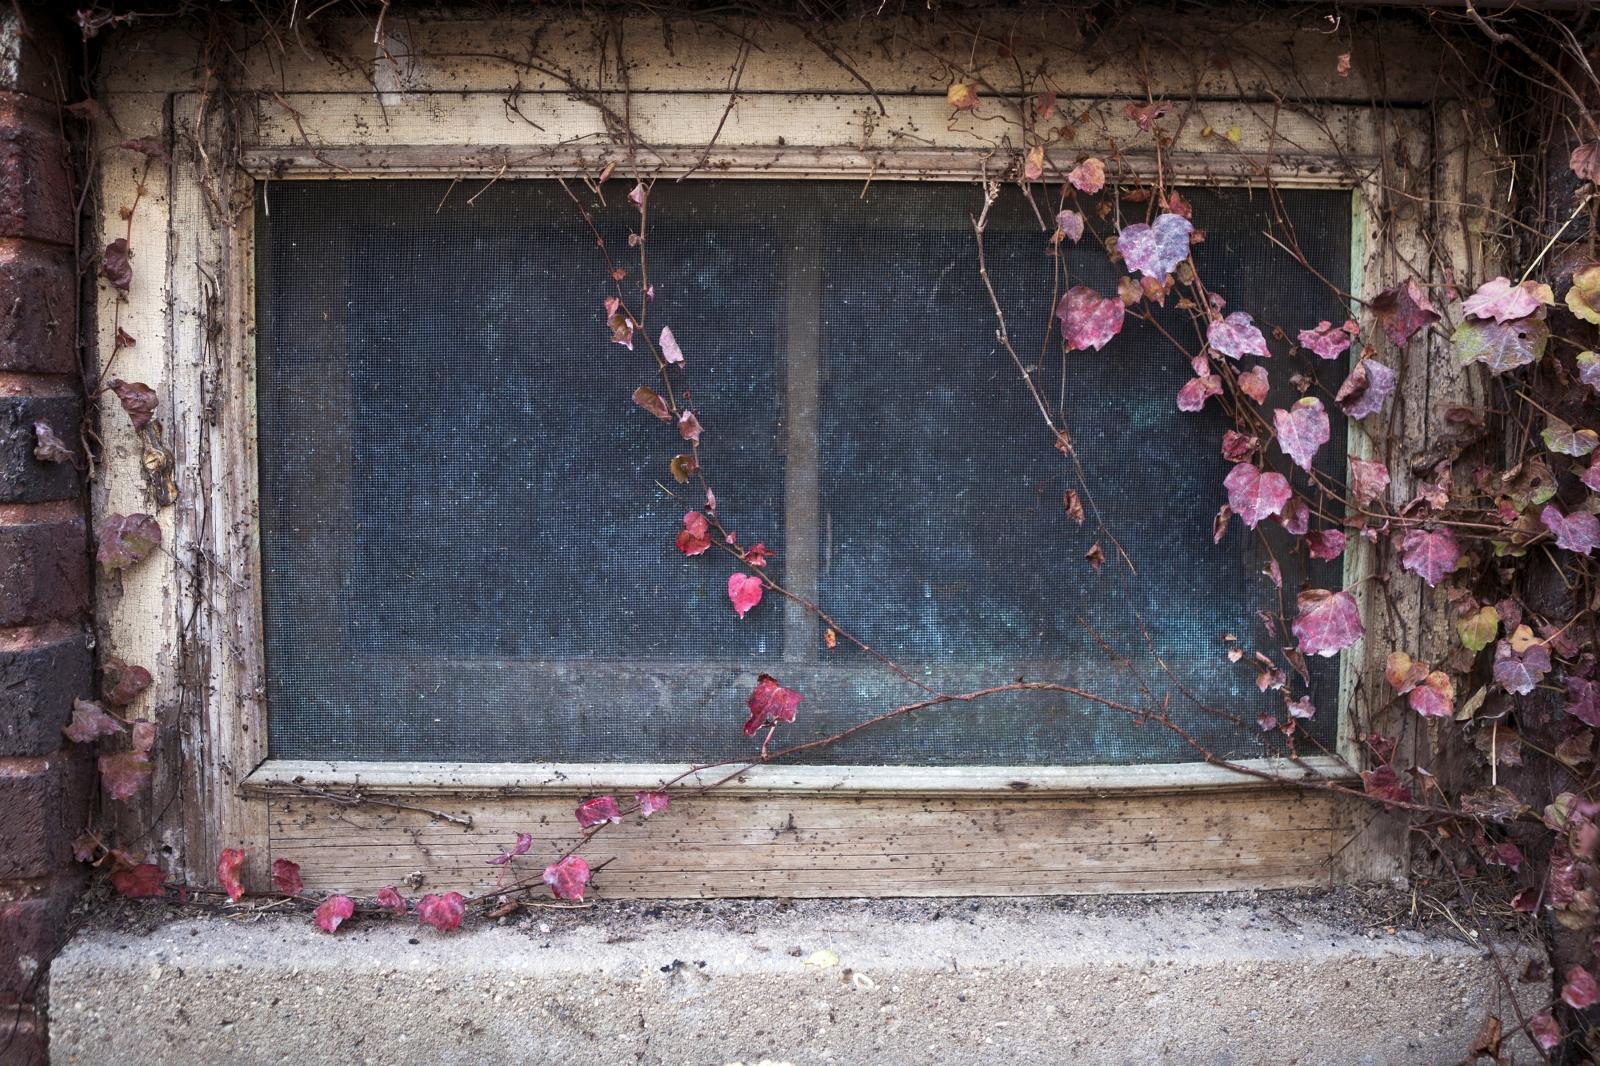 Art and Documentary Photography - Loading IMG_7972susan.jpg